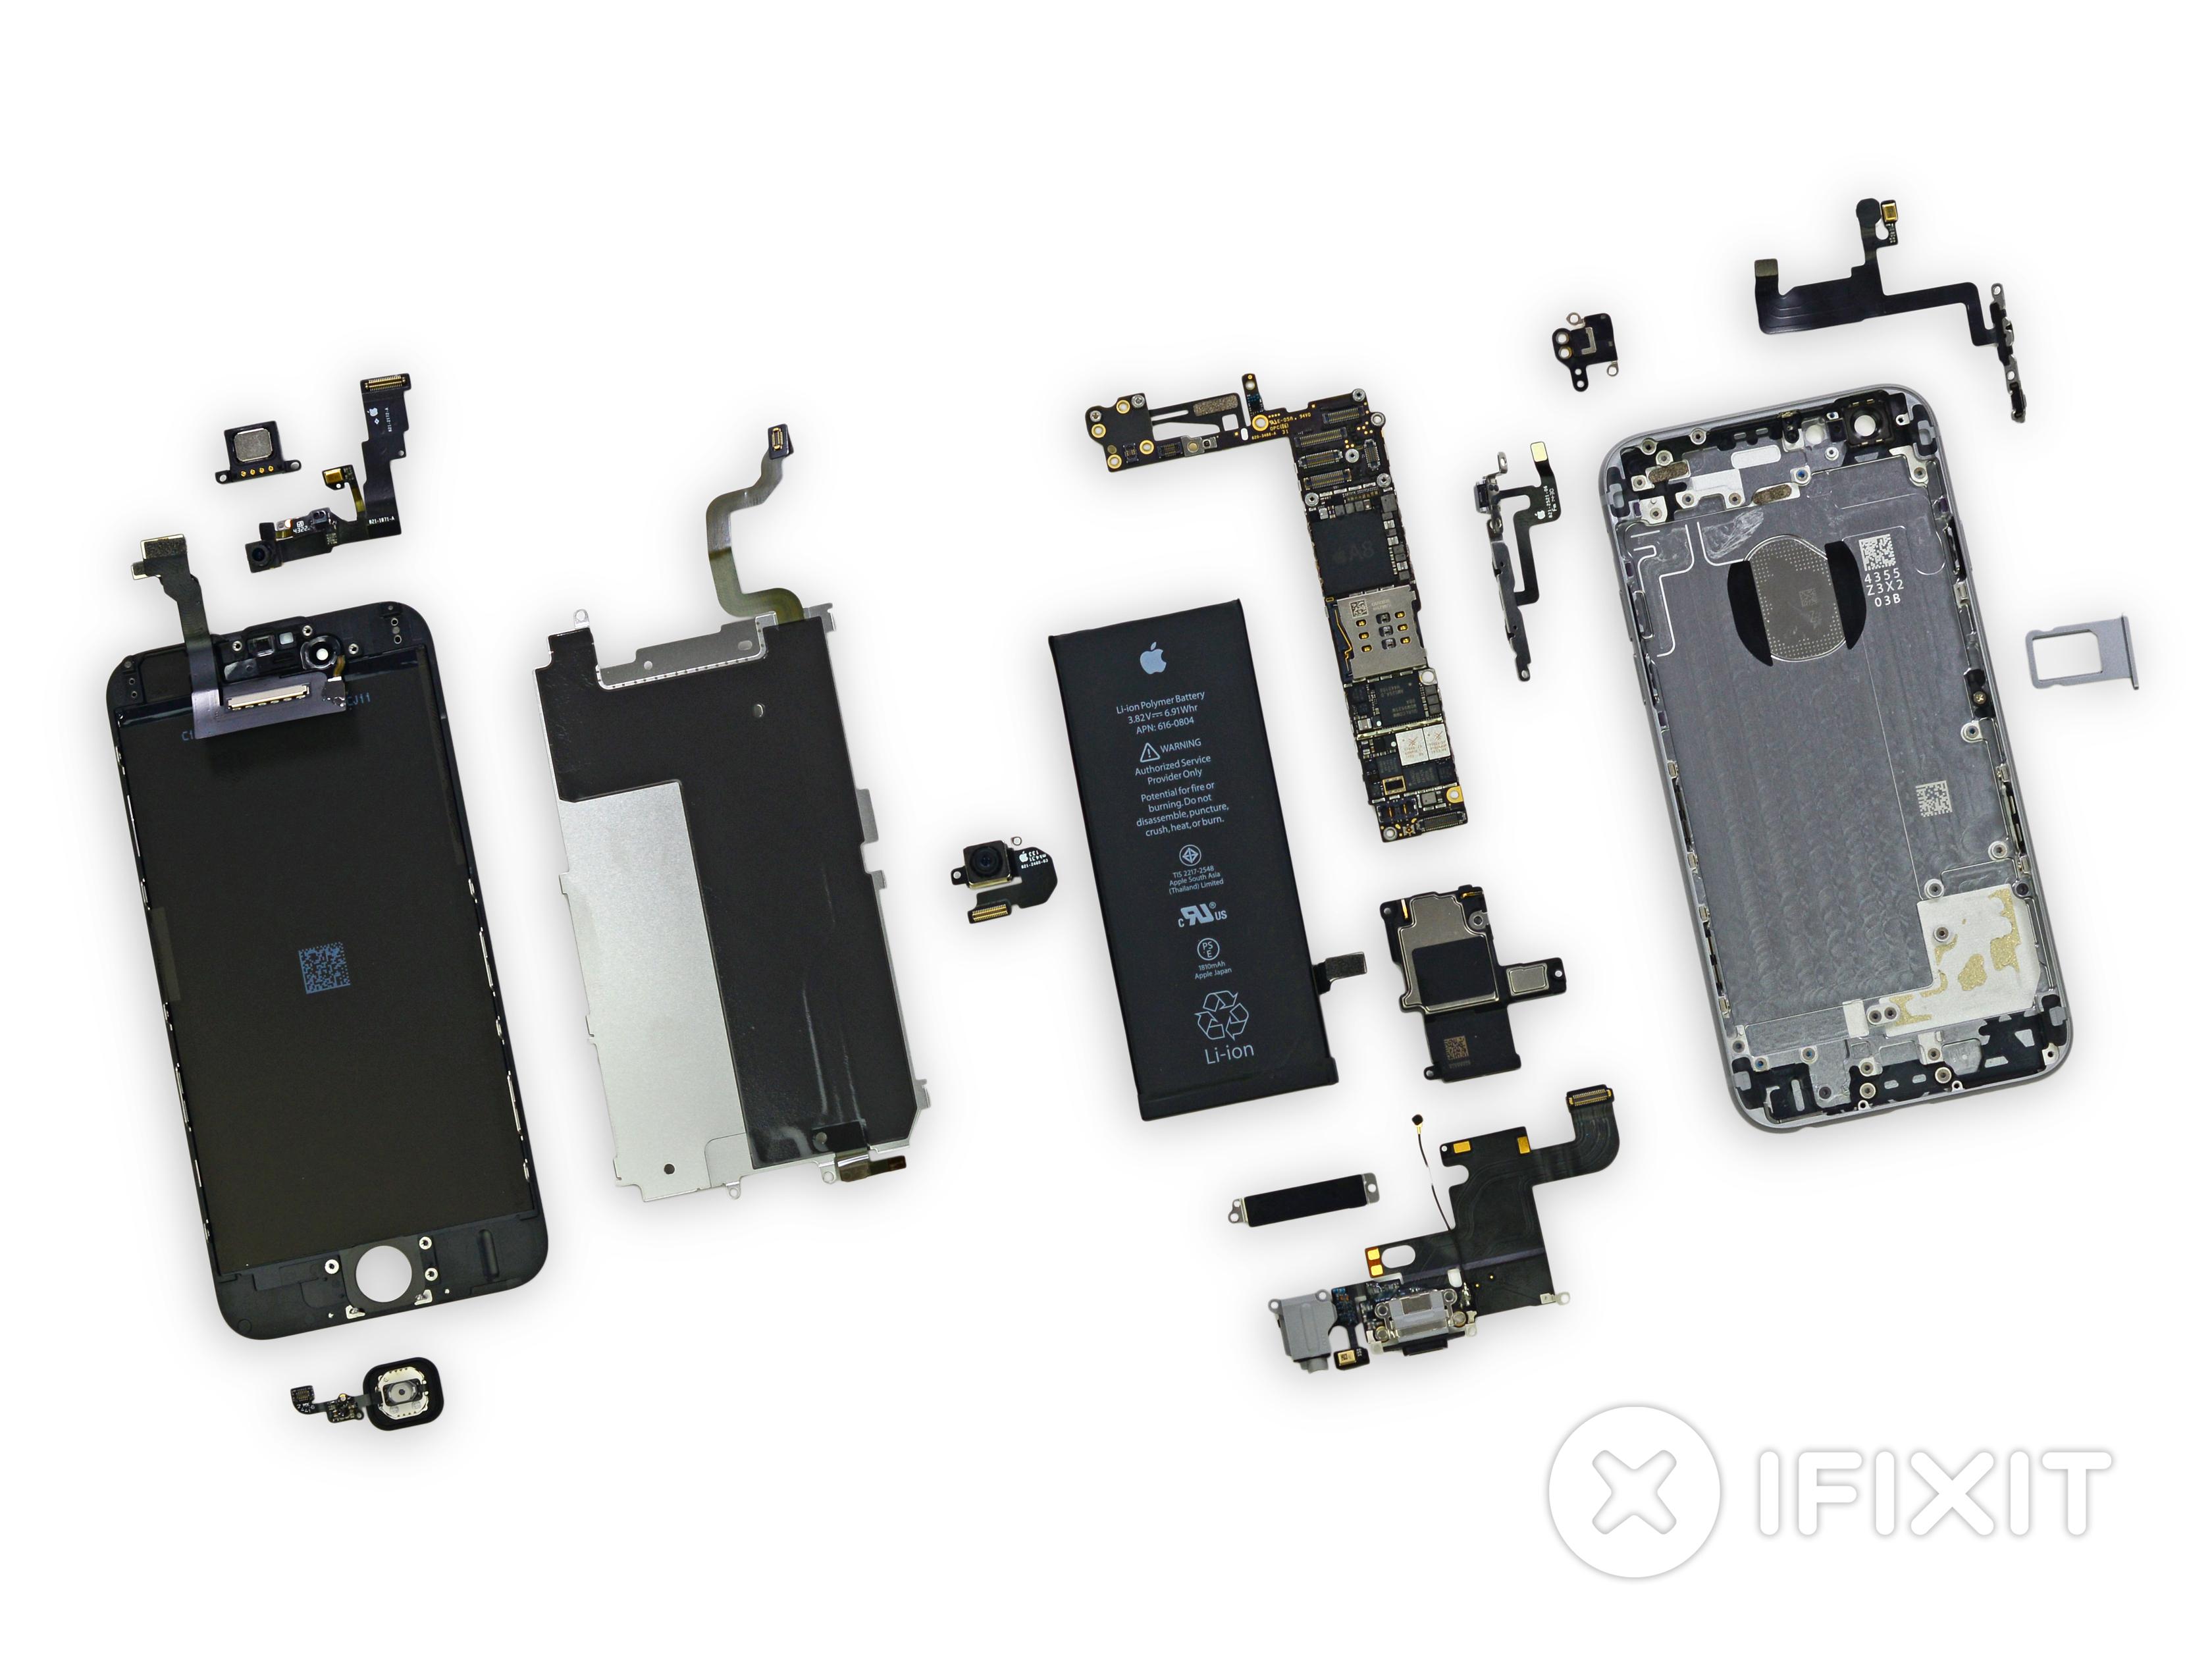 iPhone 6 desmontaje